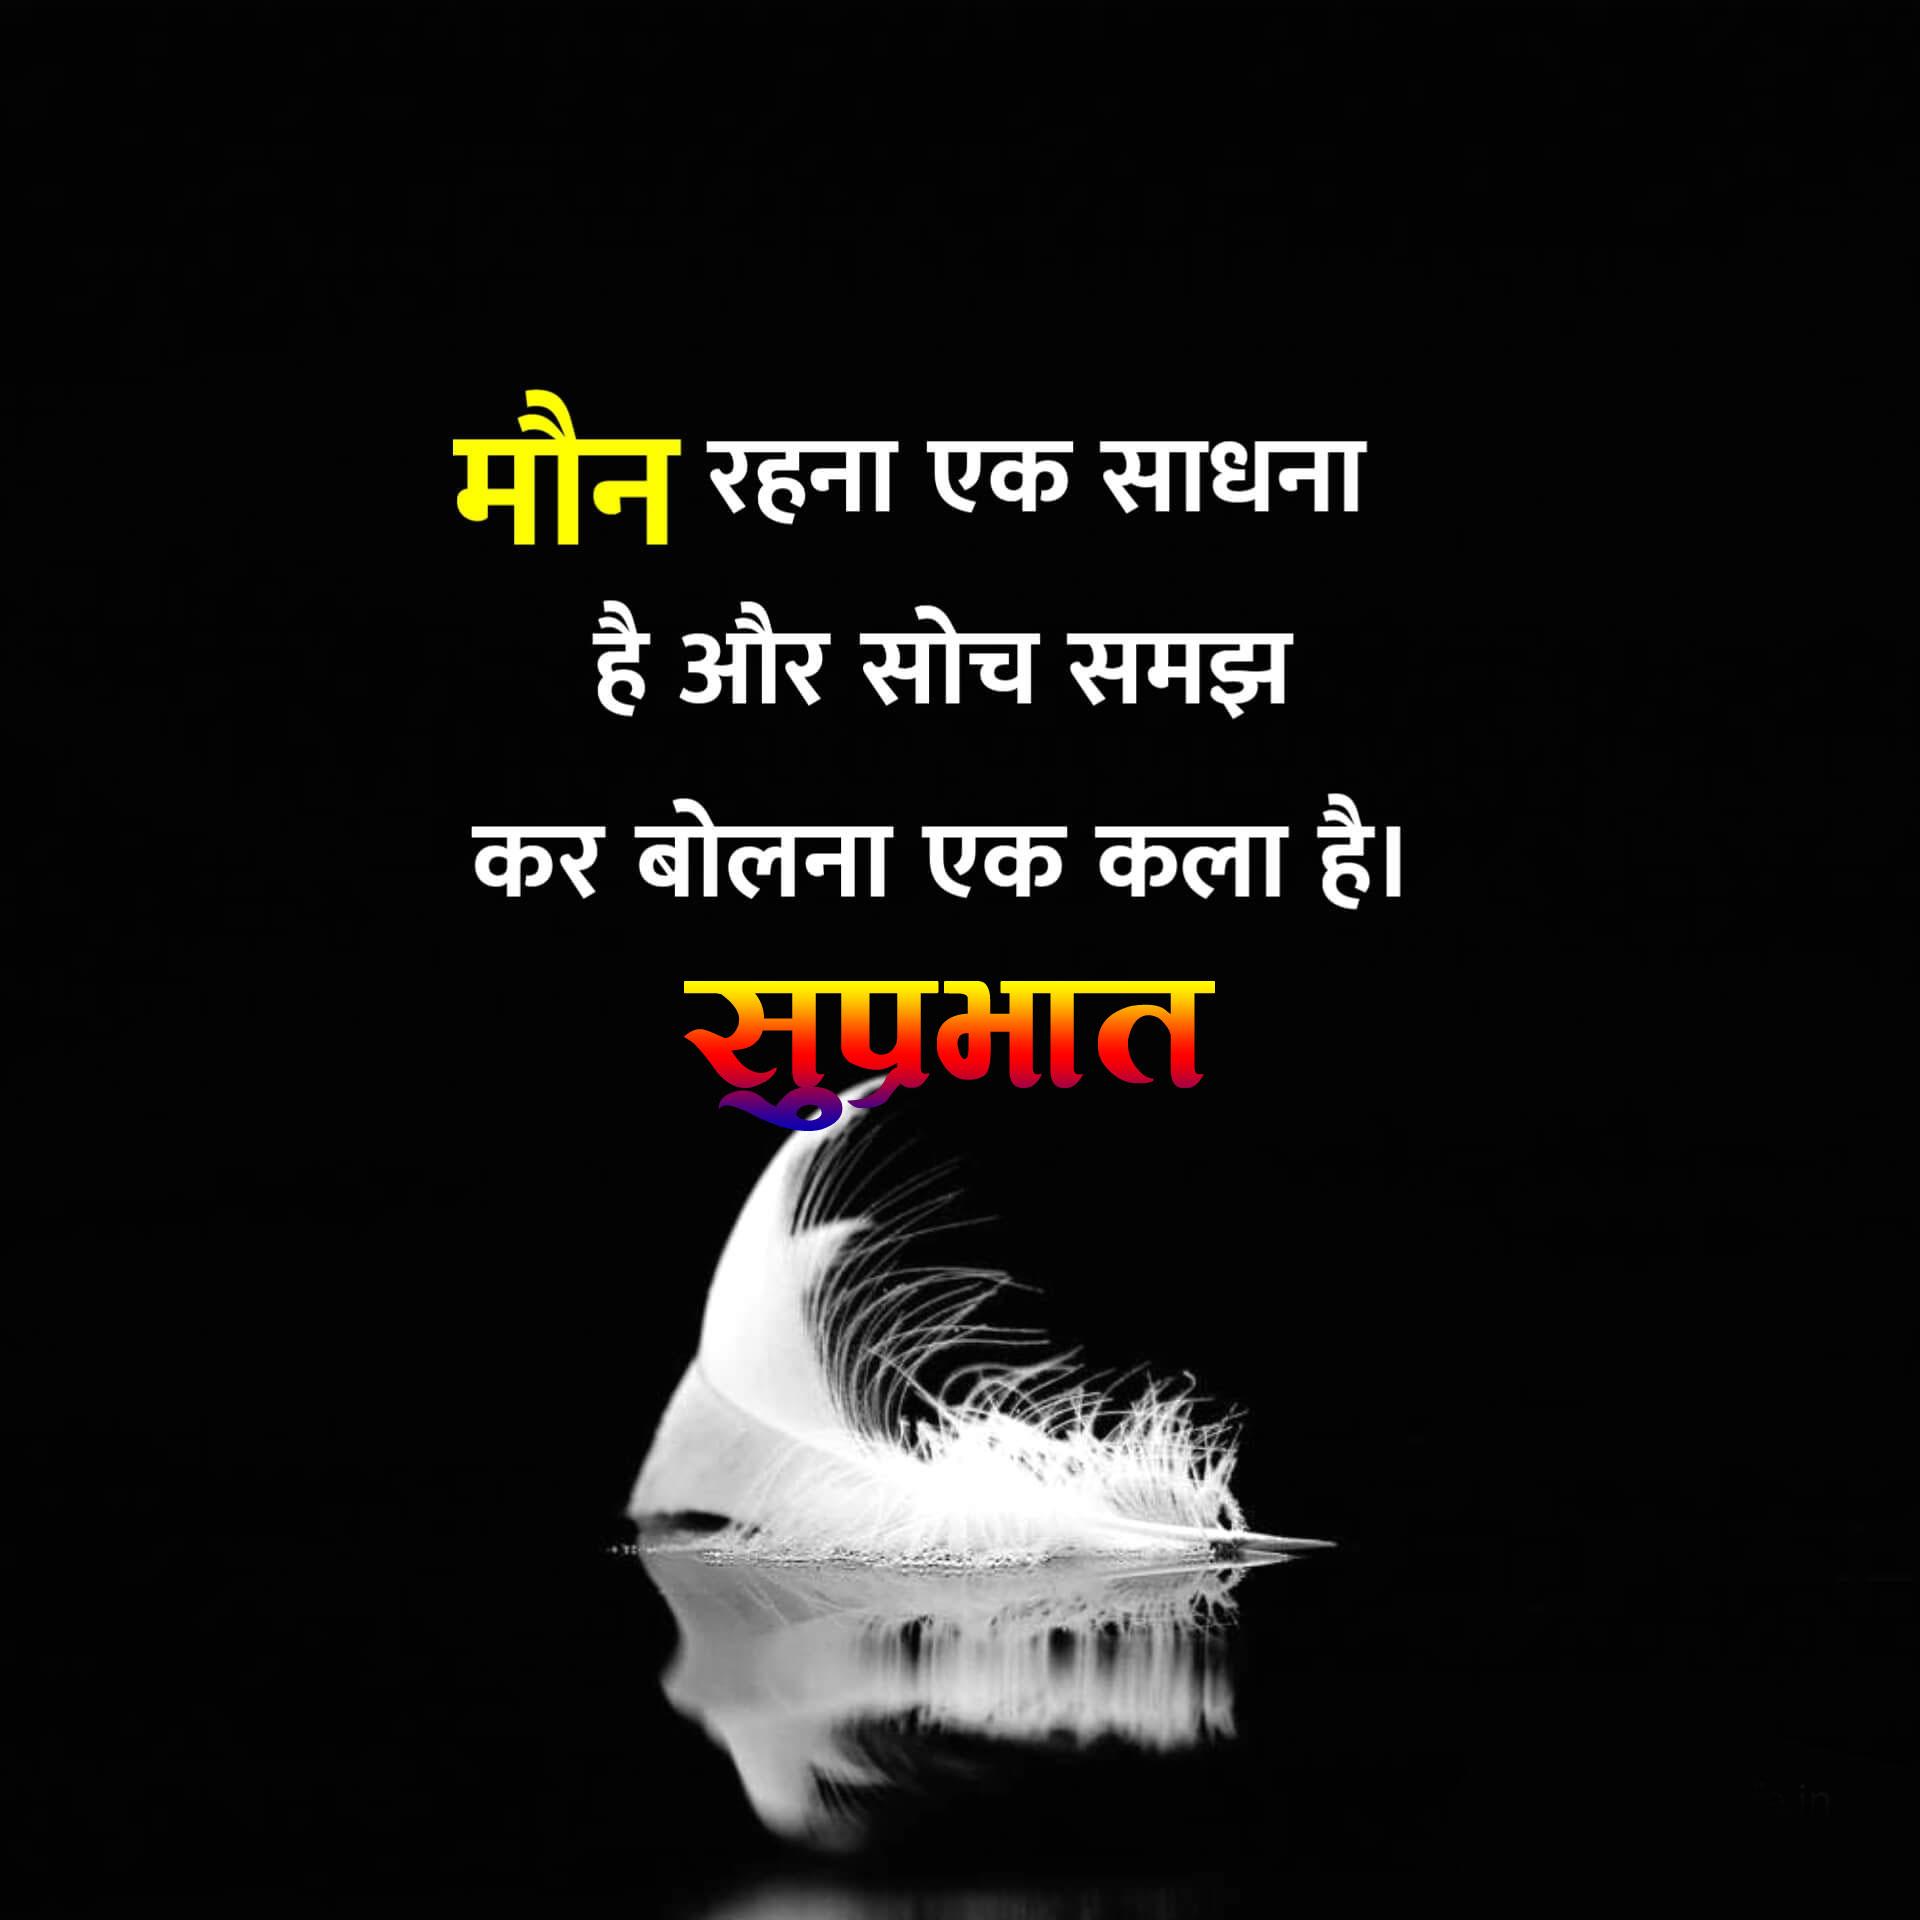 Beautiful Suprabhat Images pics hd 2021